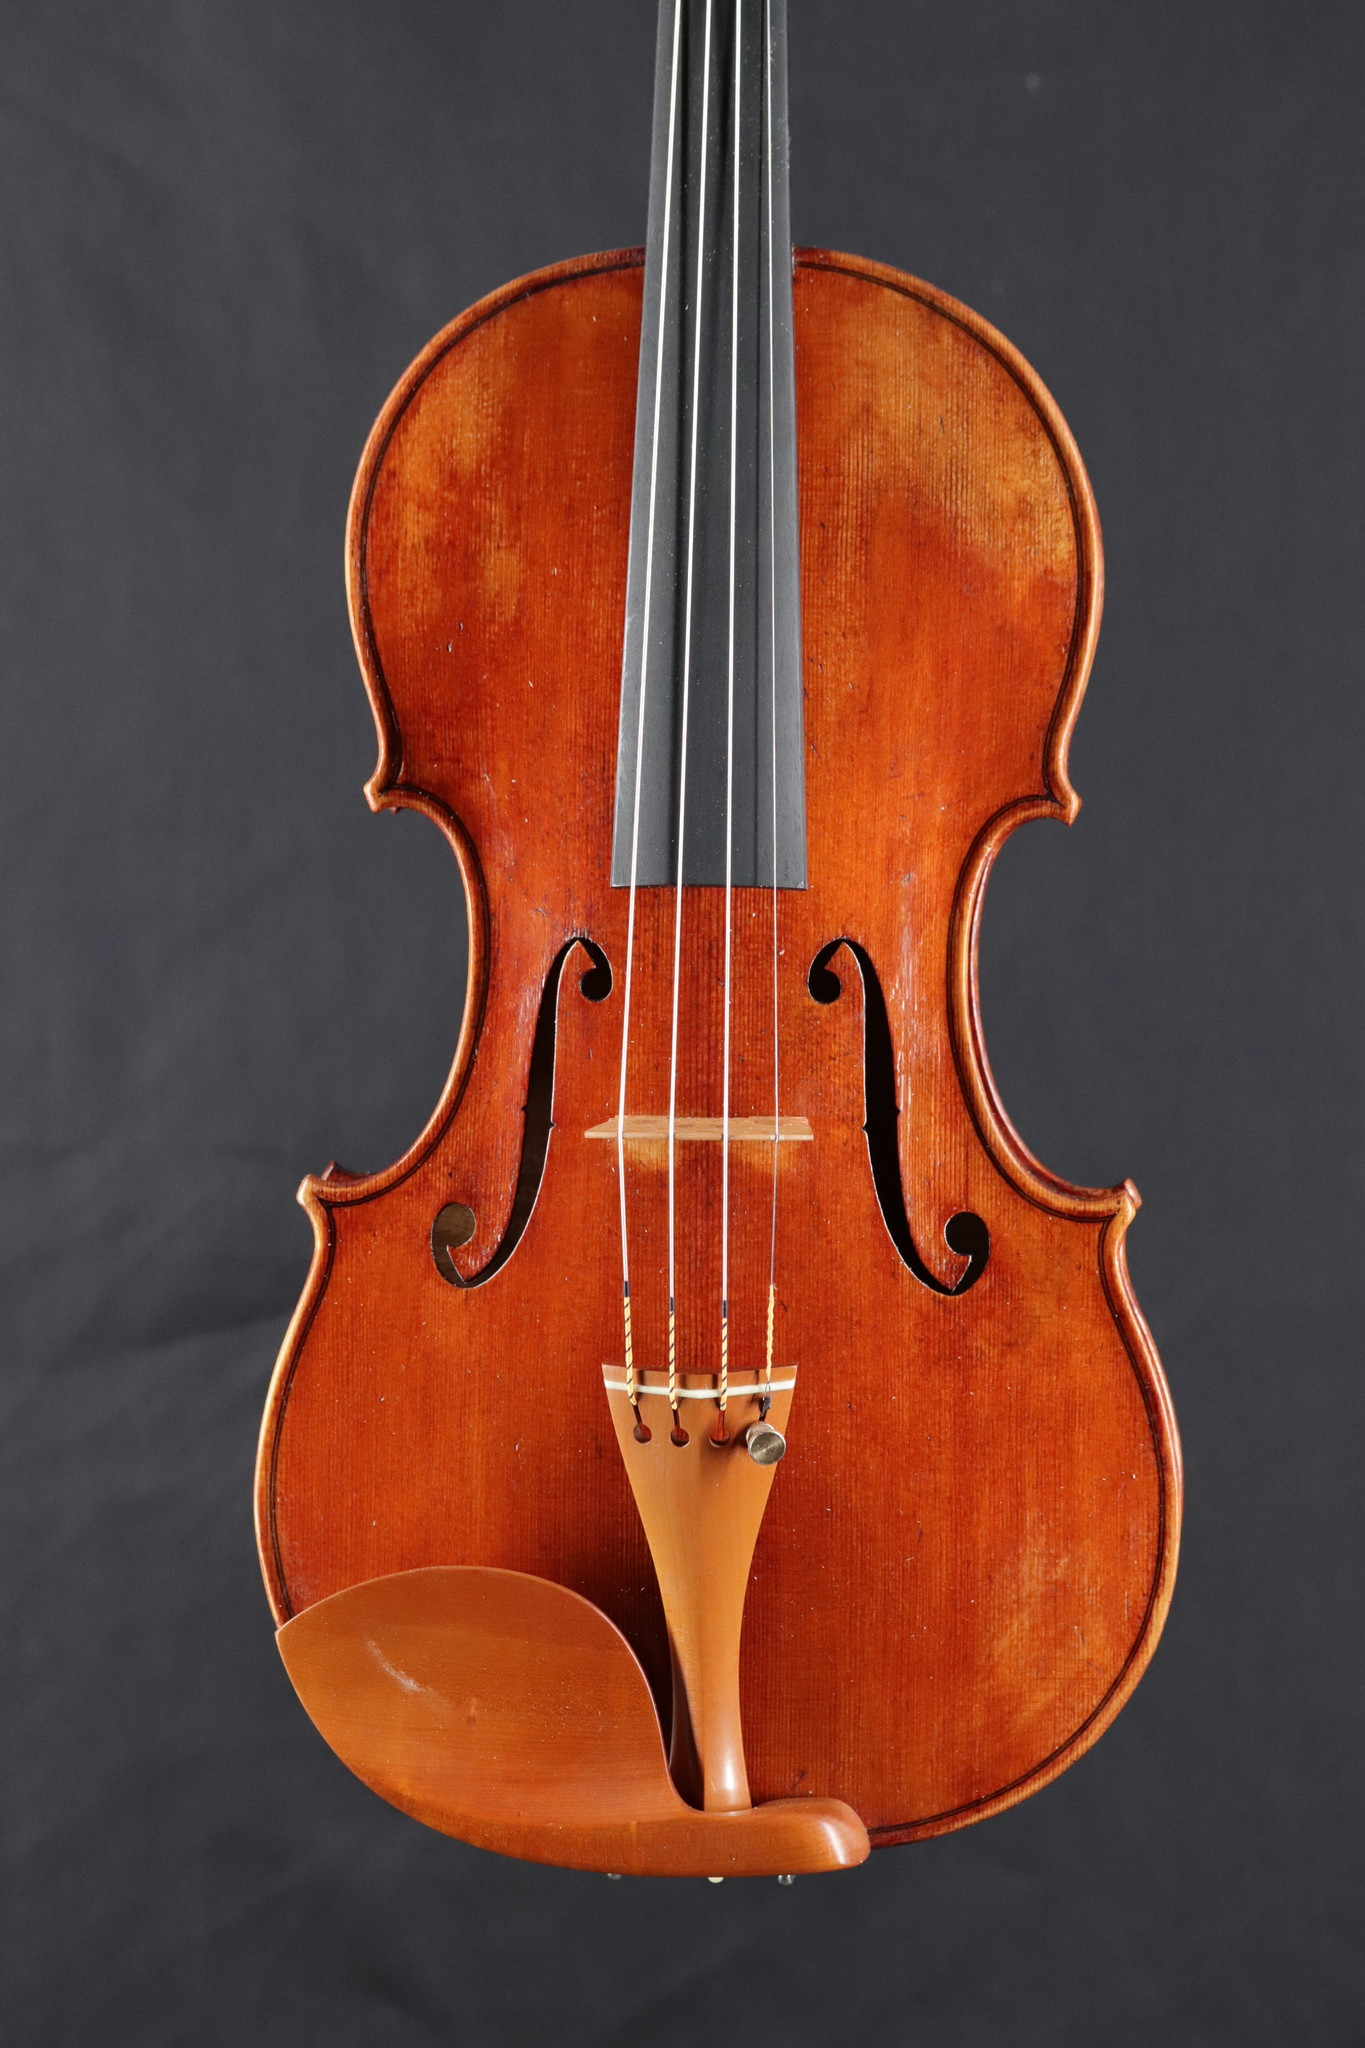 Jeffrey Robinson violin, 2020, Flagstaff AZ